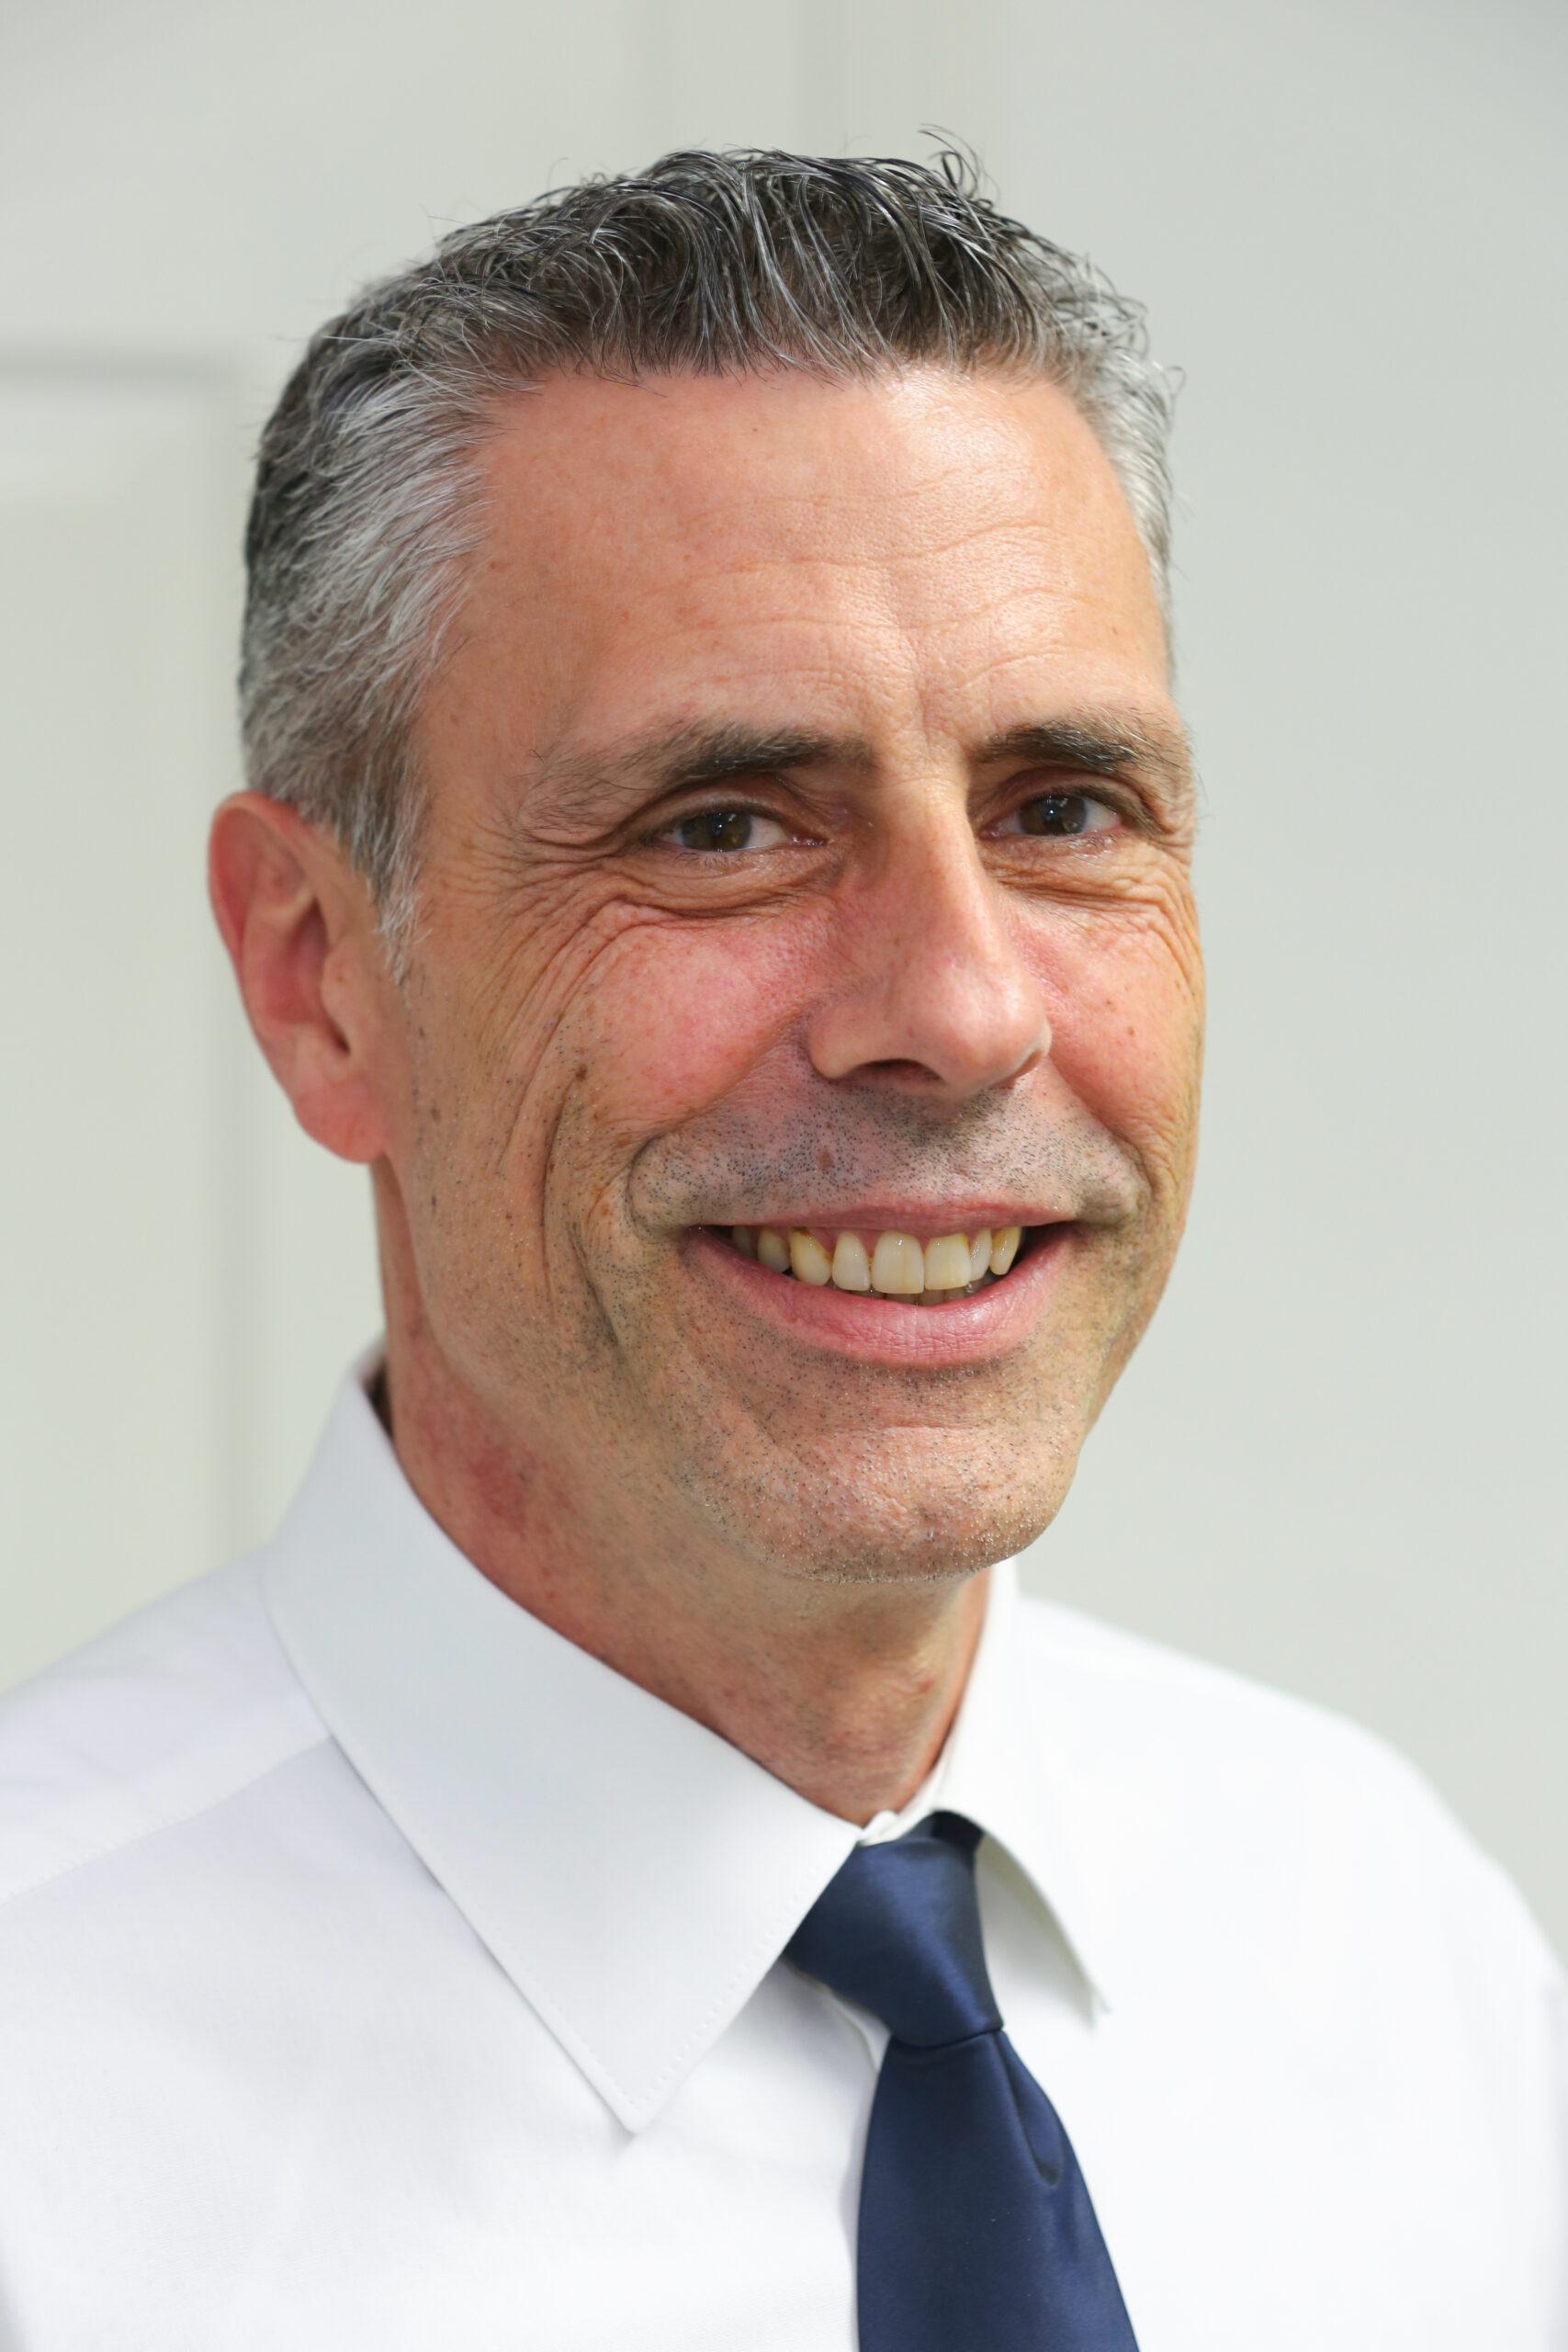 Mike-Mandlehr